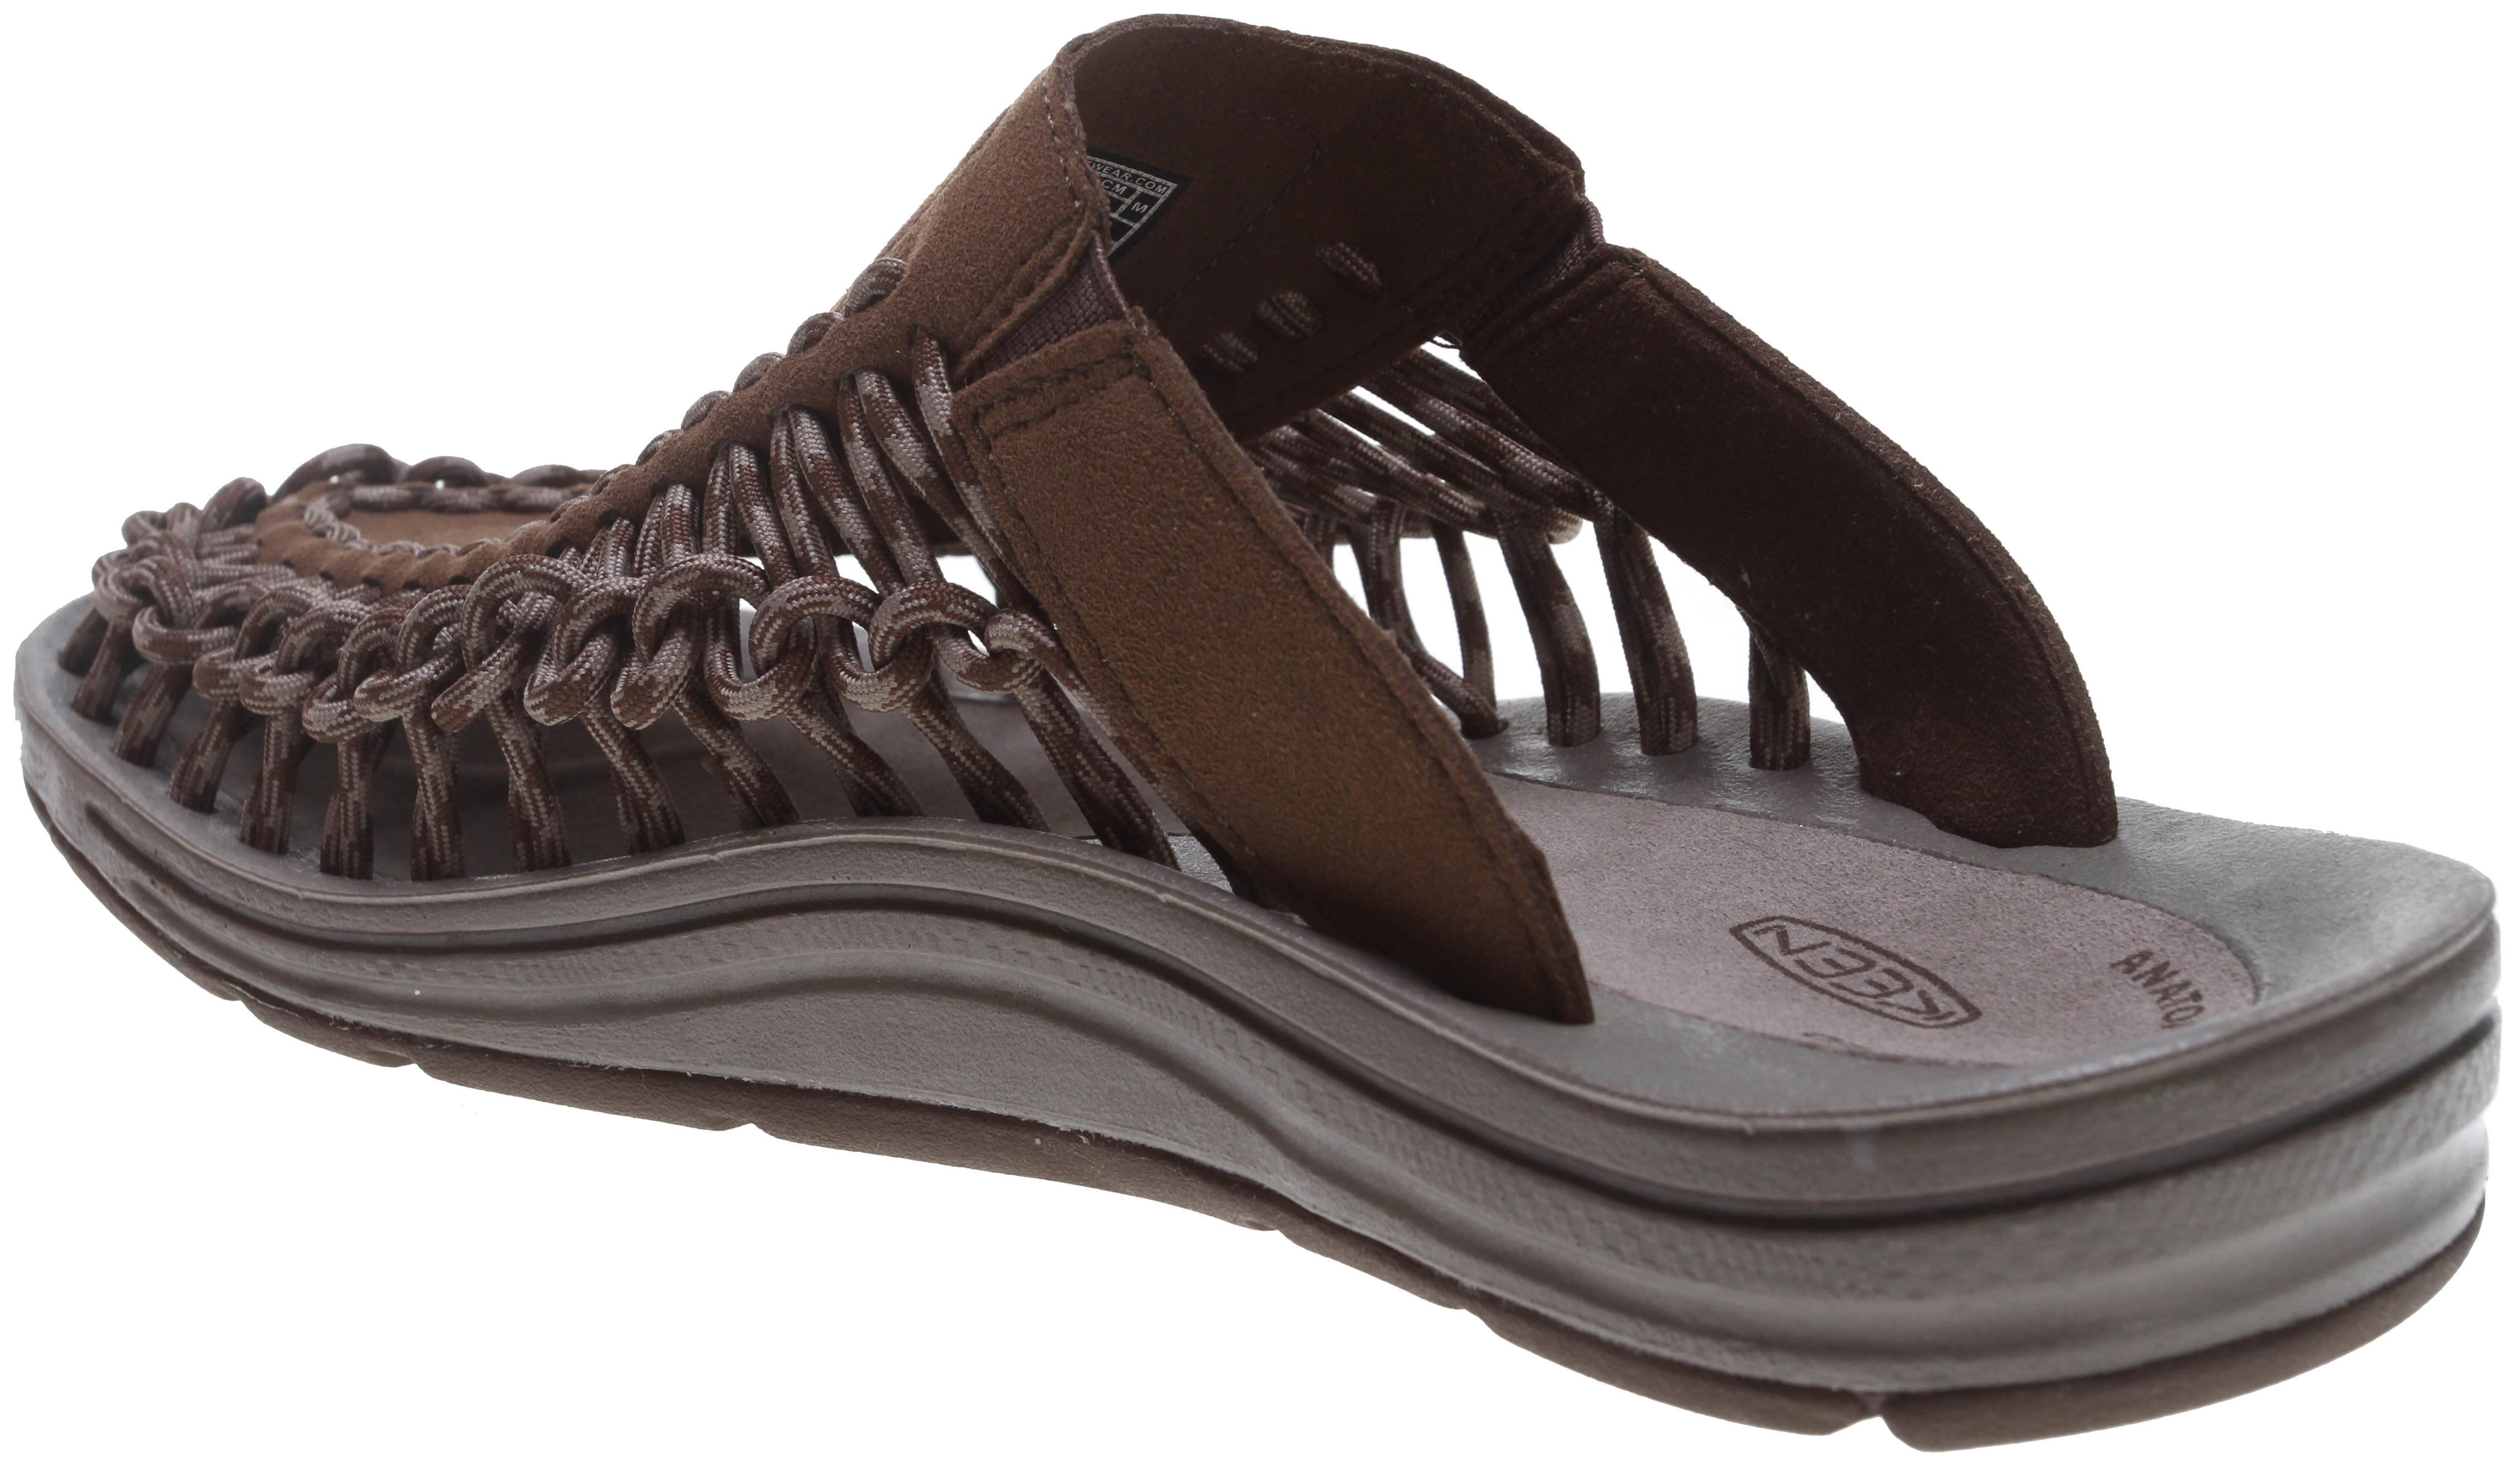 68b60c65c1c4 Keen Uneek Slide Sandals - thumbnail 3